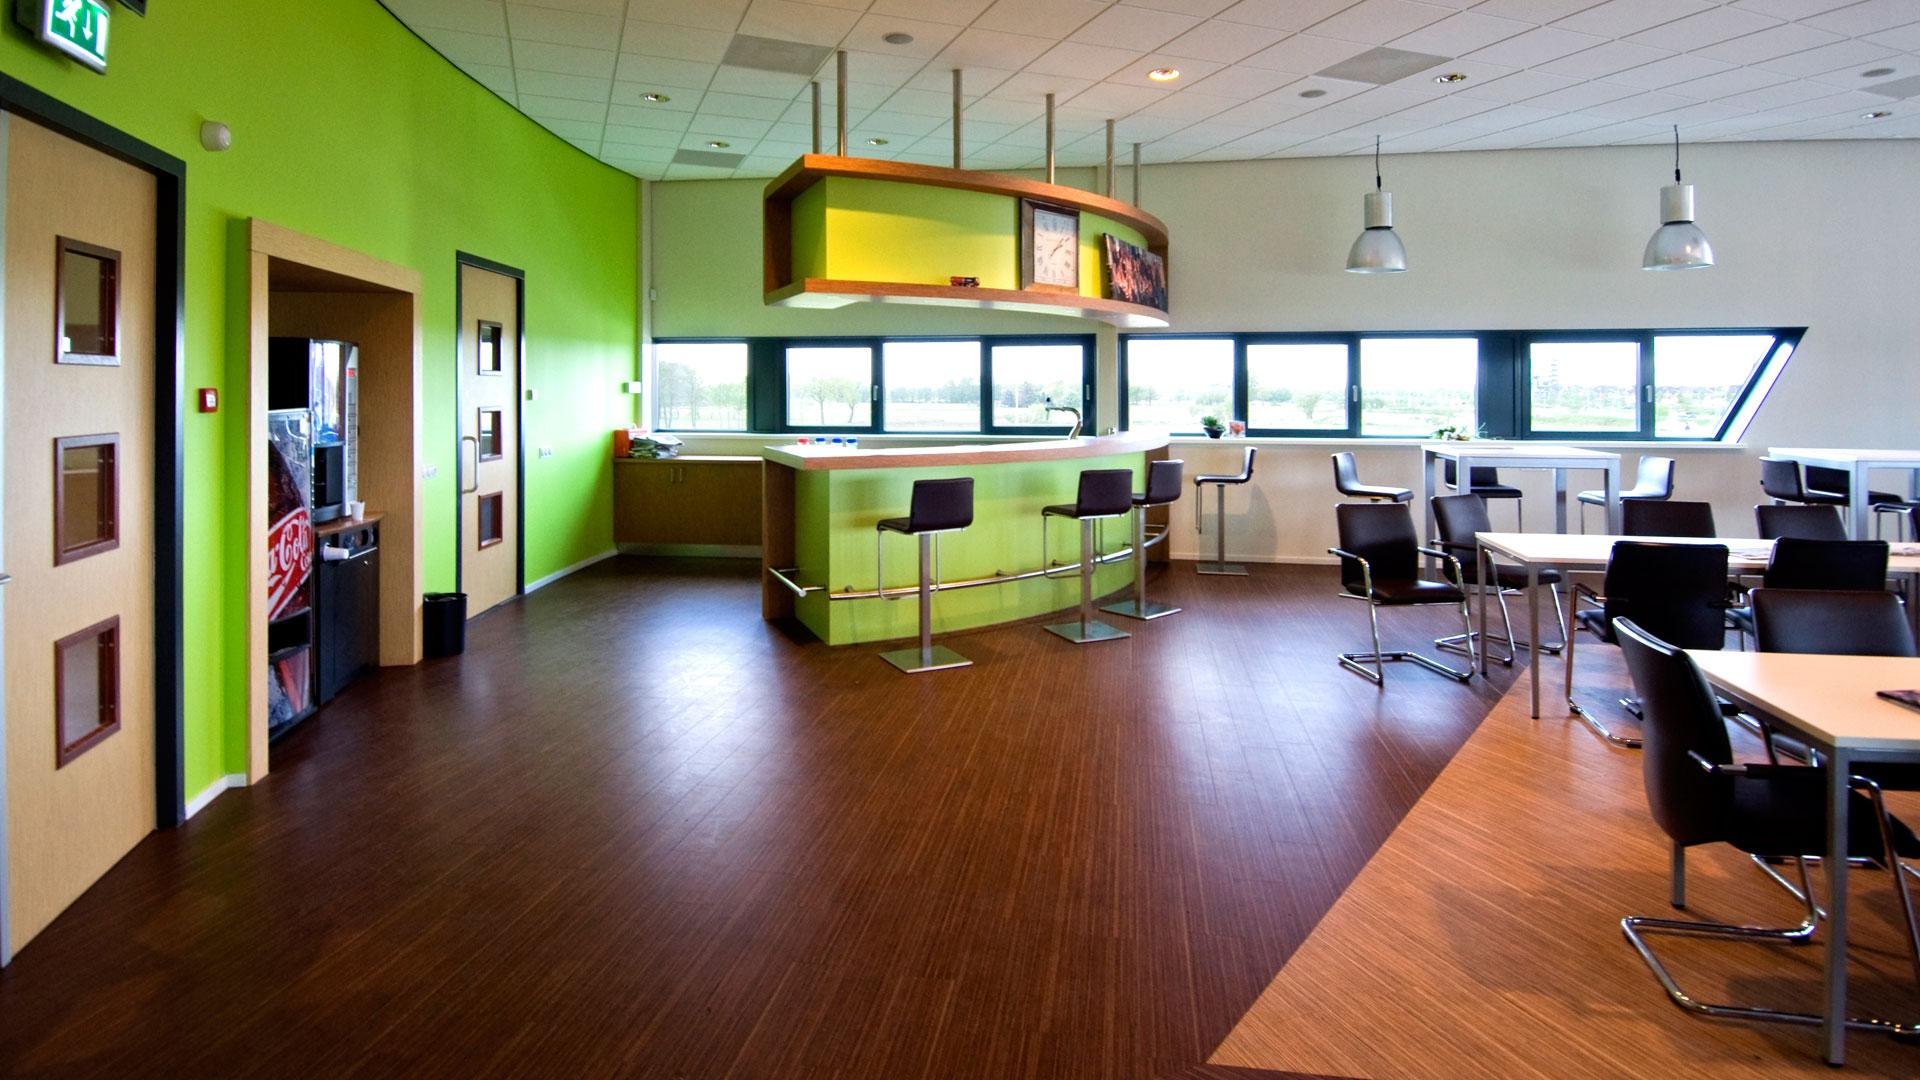 4397-Nijkerk-De-Flier-interieur-keuken-028-web - Bureau Bos